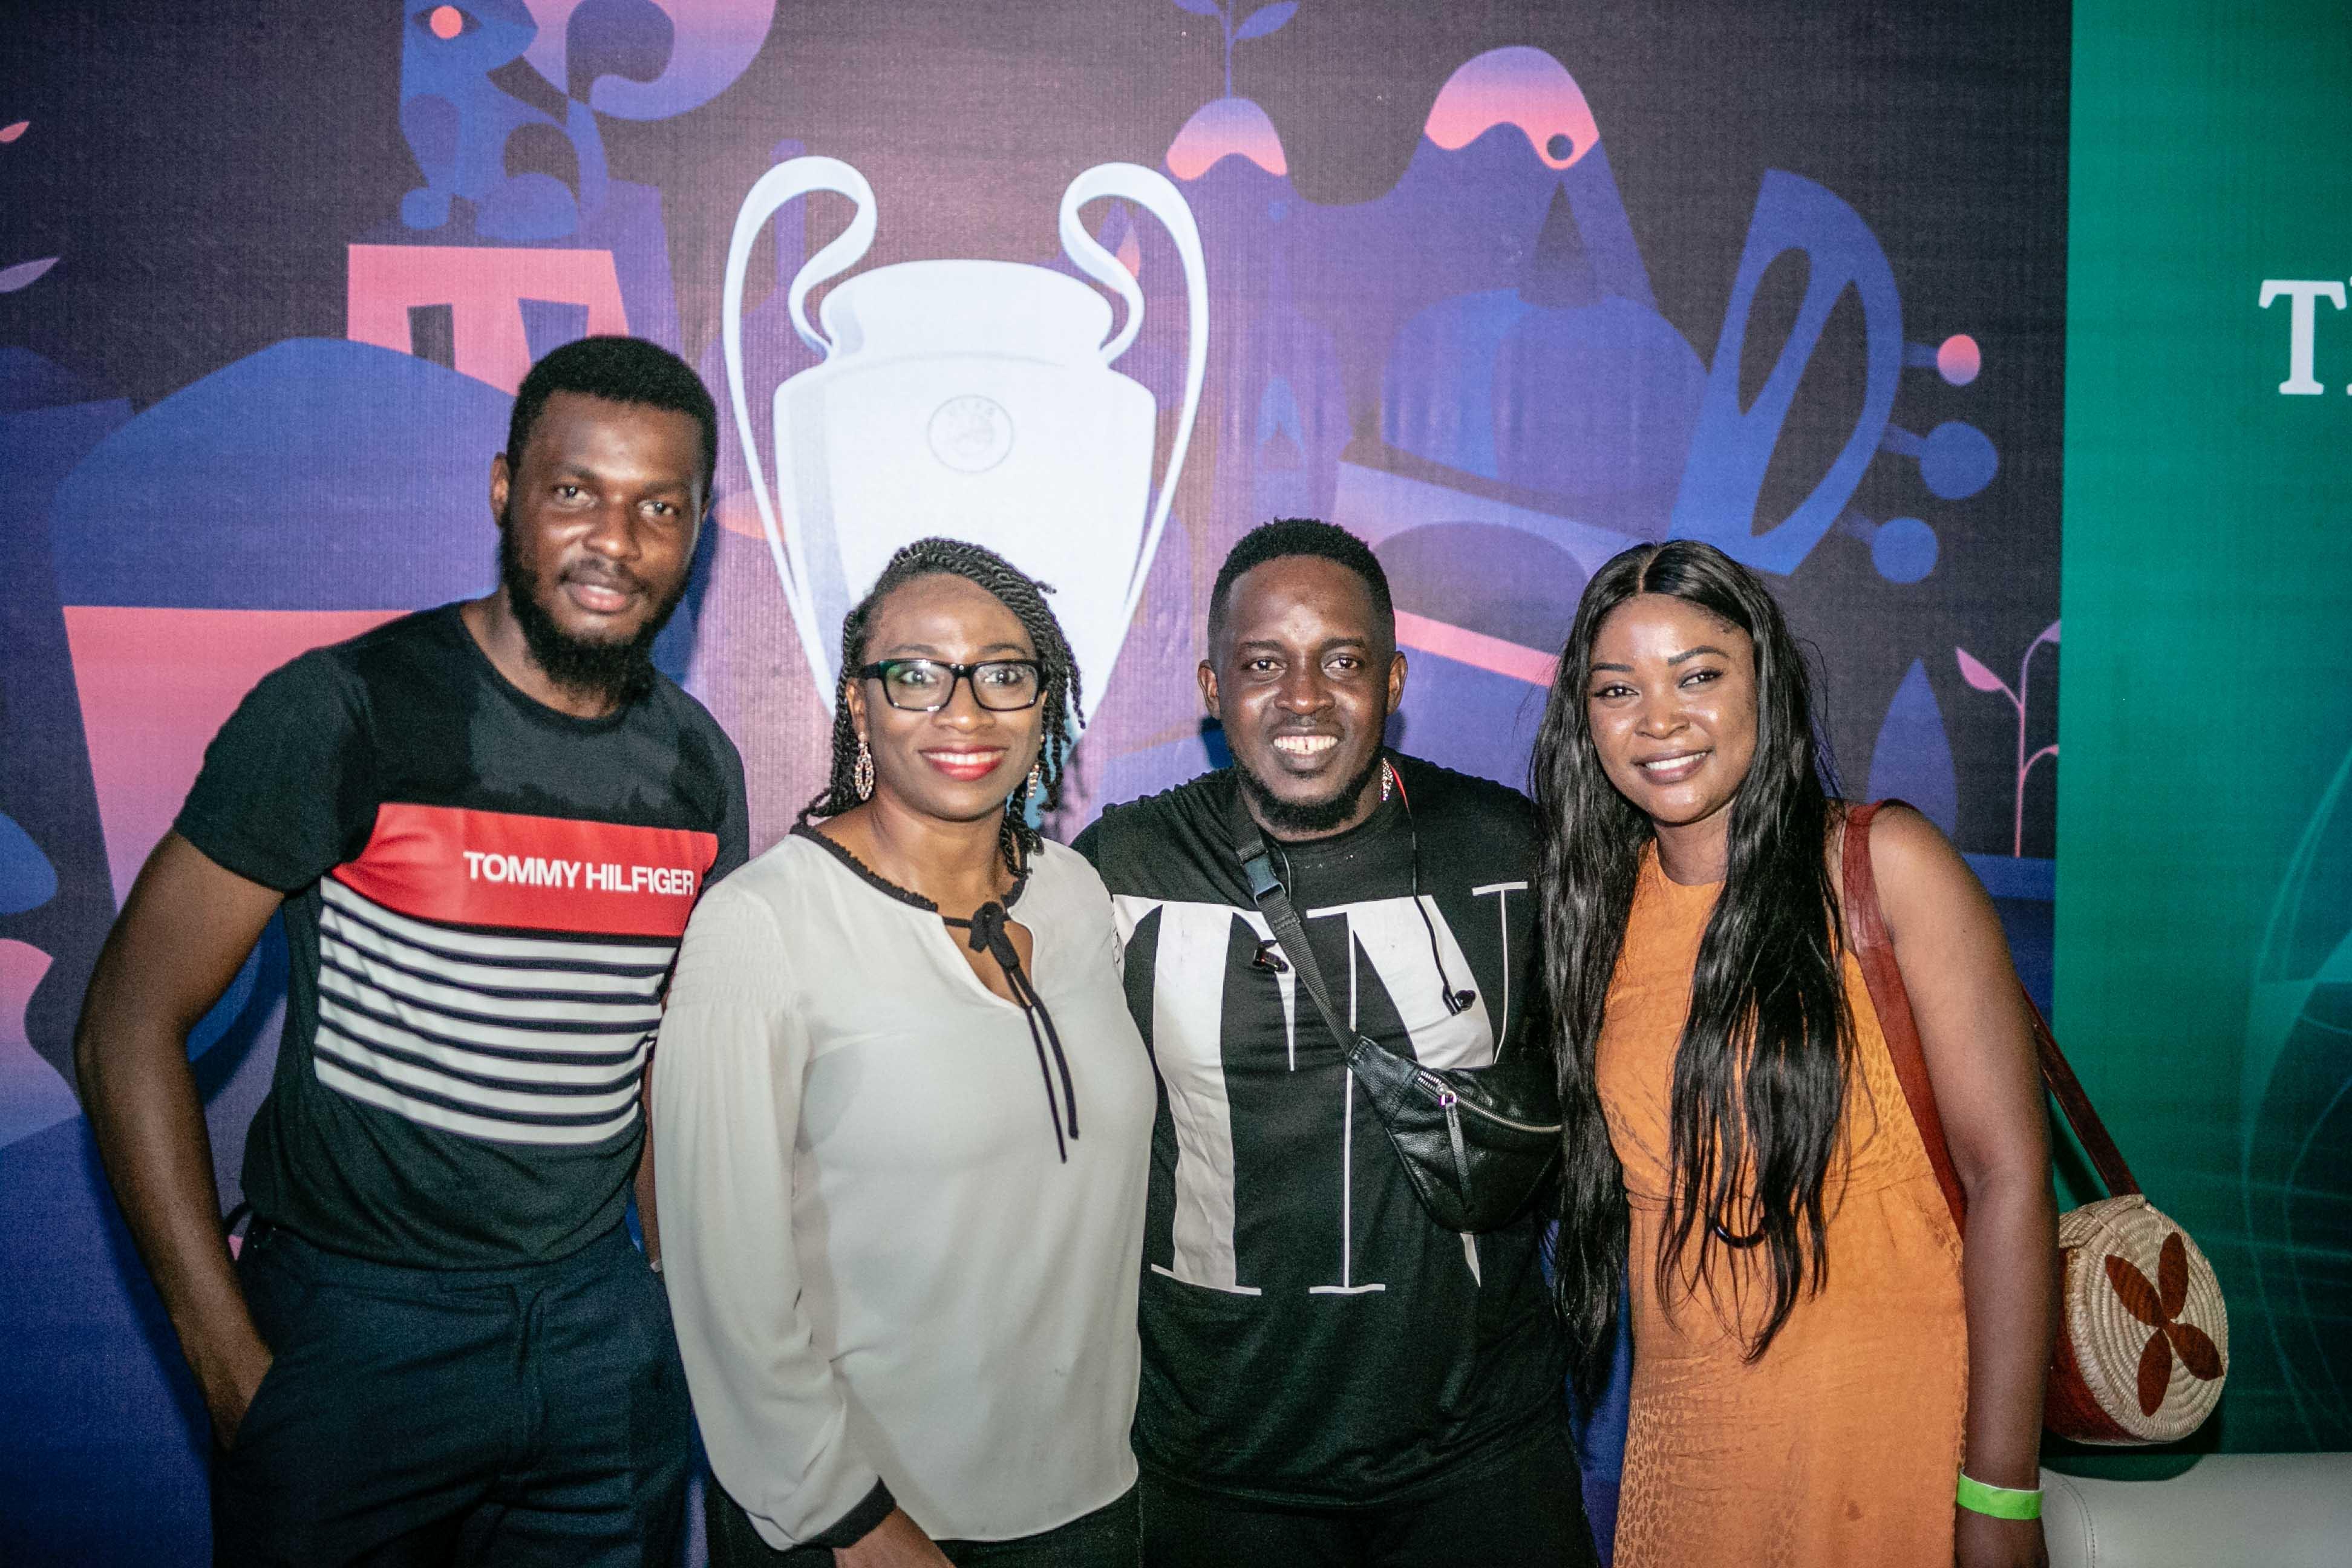 MI Abaga, TeeA, Uti Nwachukwu, DJ BigN, Folu Storms, and More Excite Consumers at The Heineken UCL Final Match Viewing